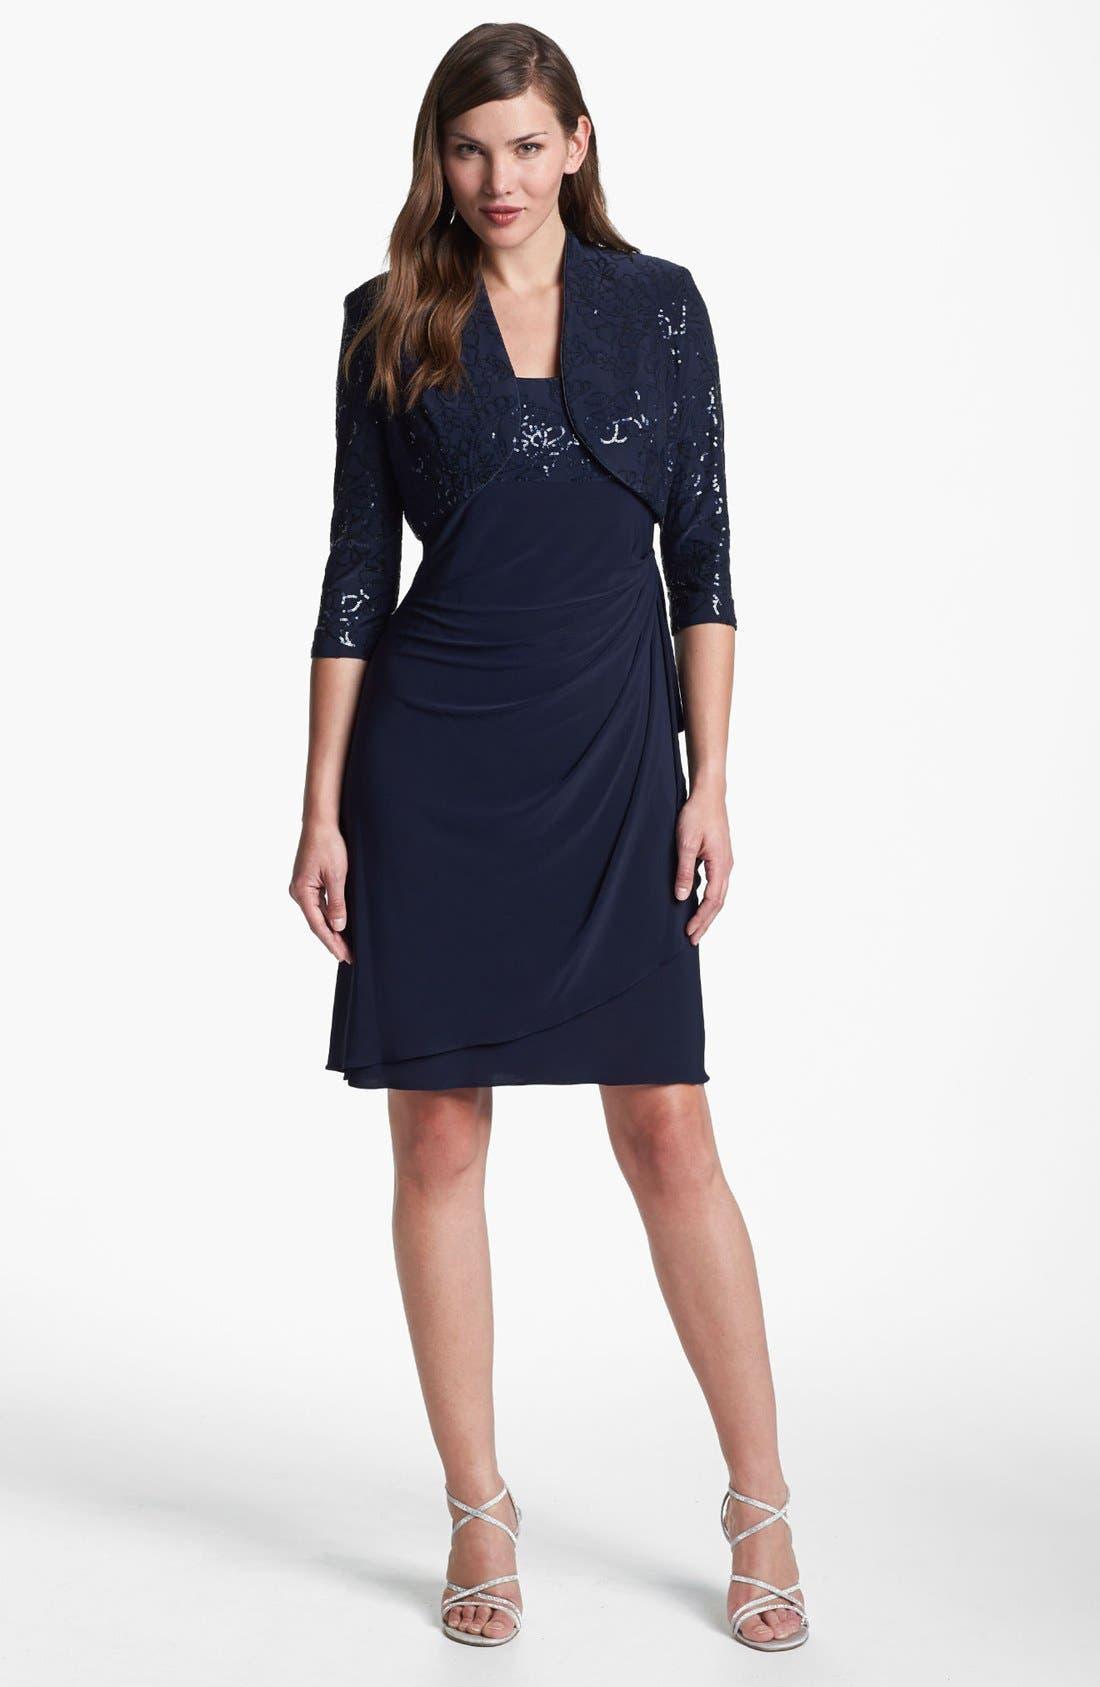 Alternate Image 1 Selected - Alex Evenings Sequin Trim Dress & Bolero (Petite)